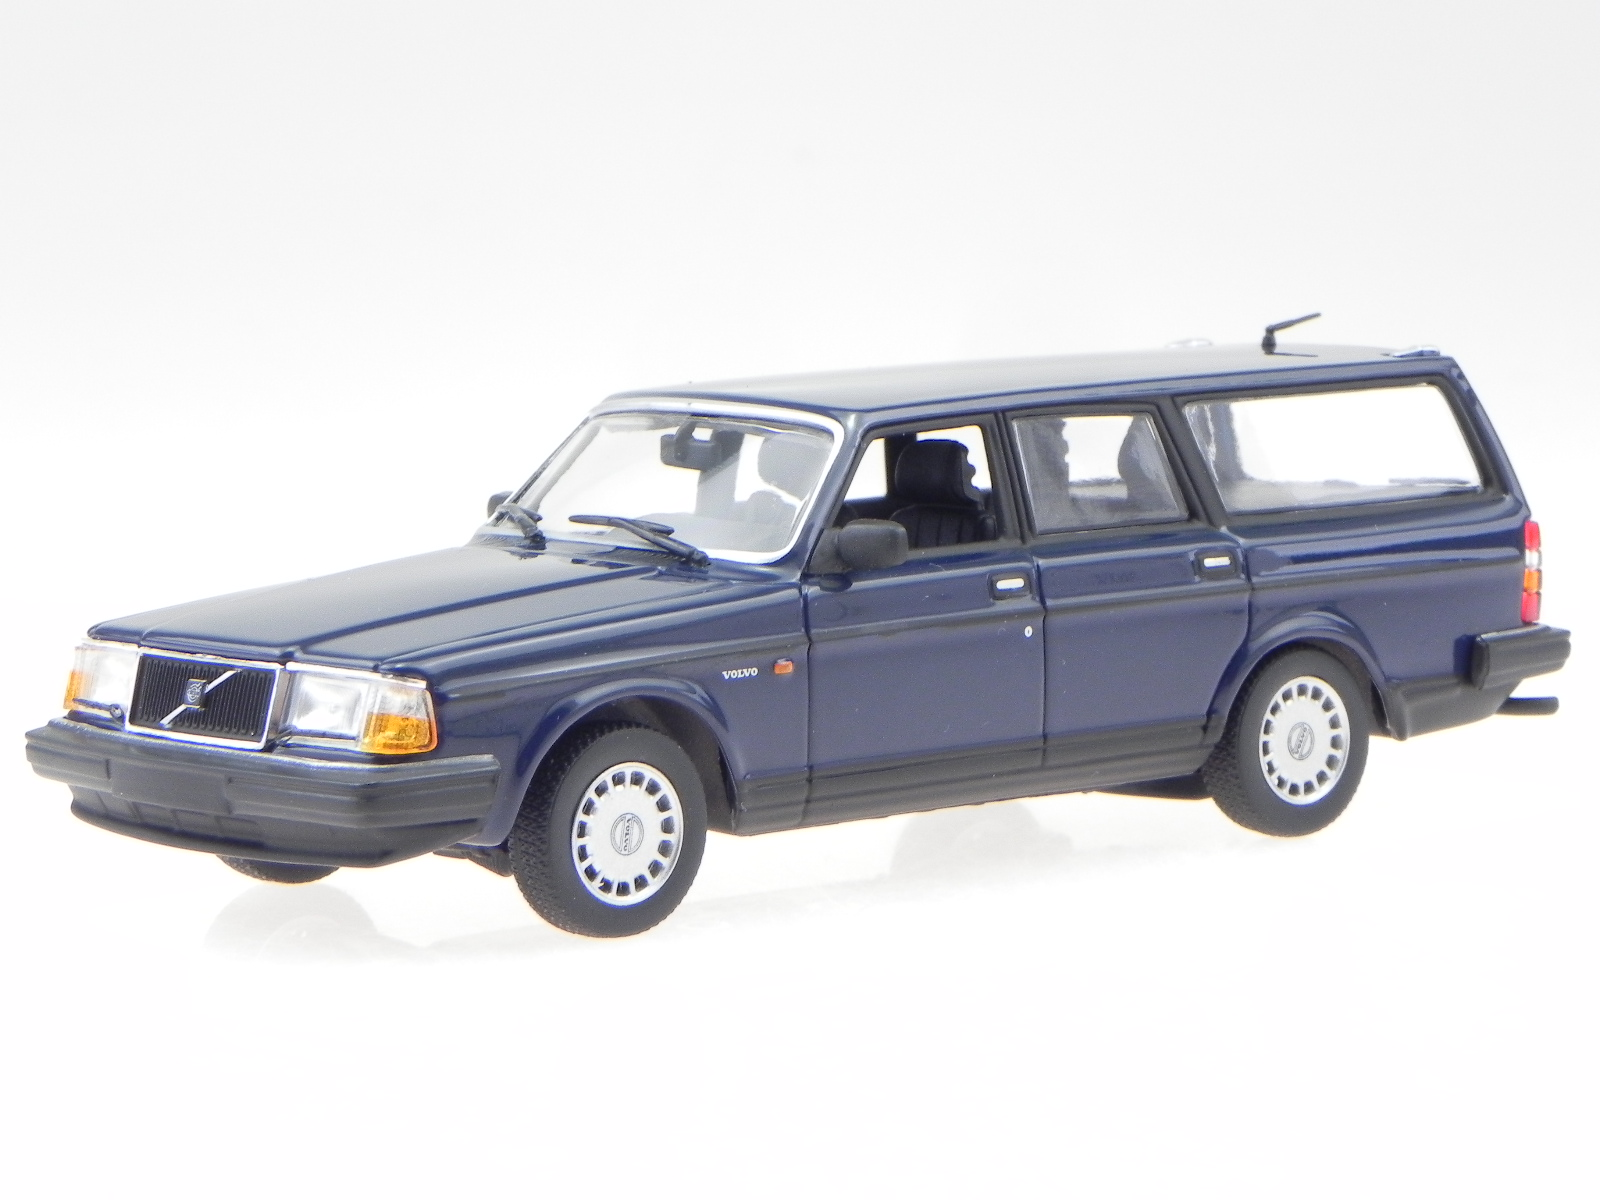 Volvo 240 Gl Break 1986 Dunklbleu Véhicule Miniature 940171412 Maxichamps 1:43